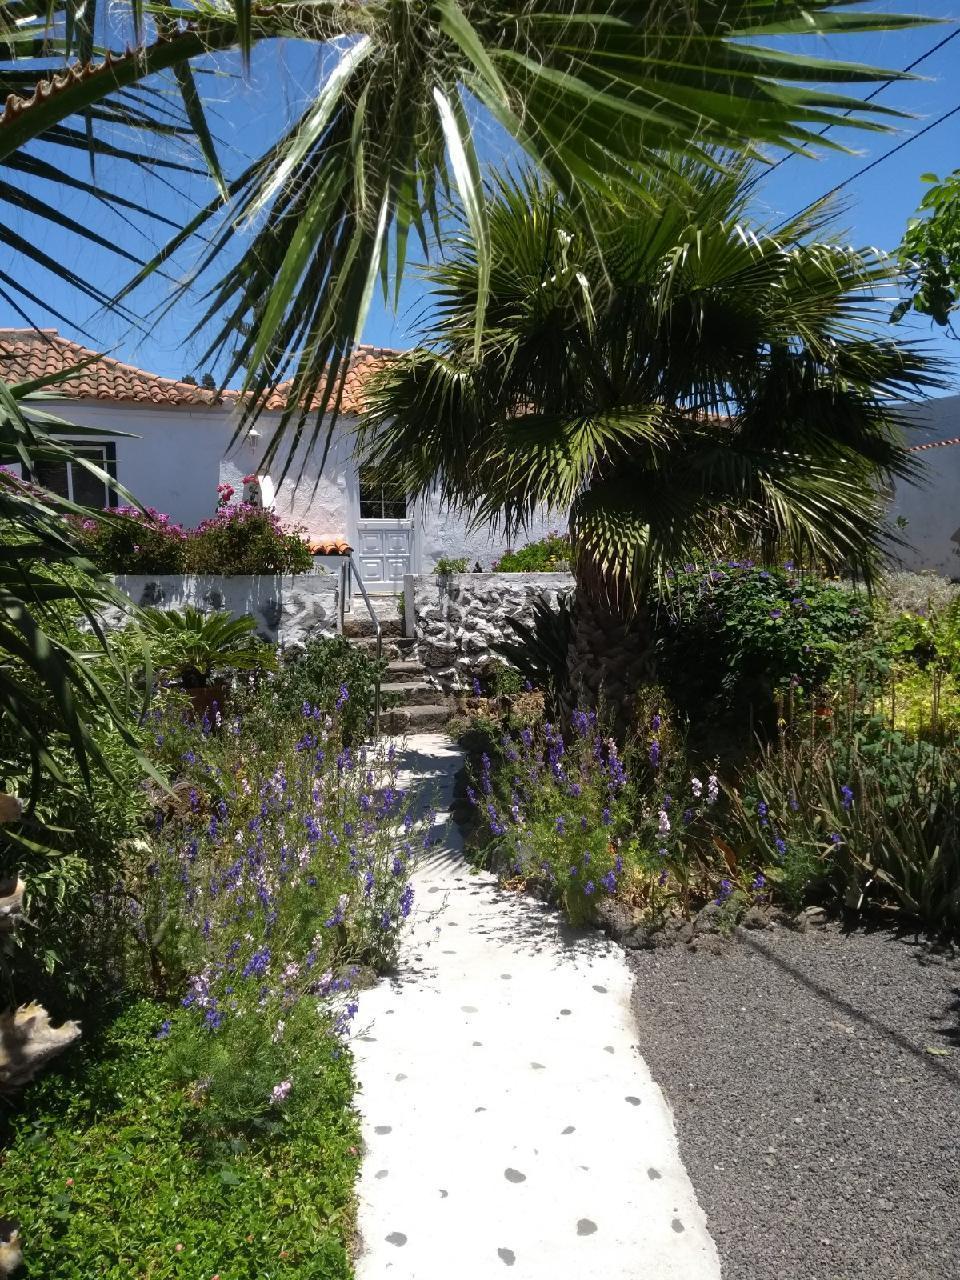 Ferienhaus Finca Primavera (144701), El Paso, La Palma, Kanarische Inseln, Spanien, Bild 25